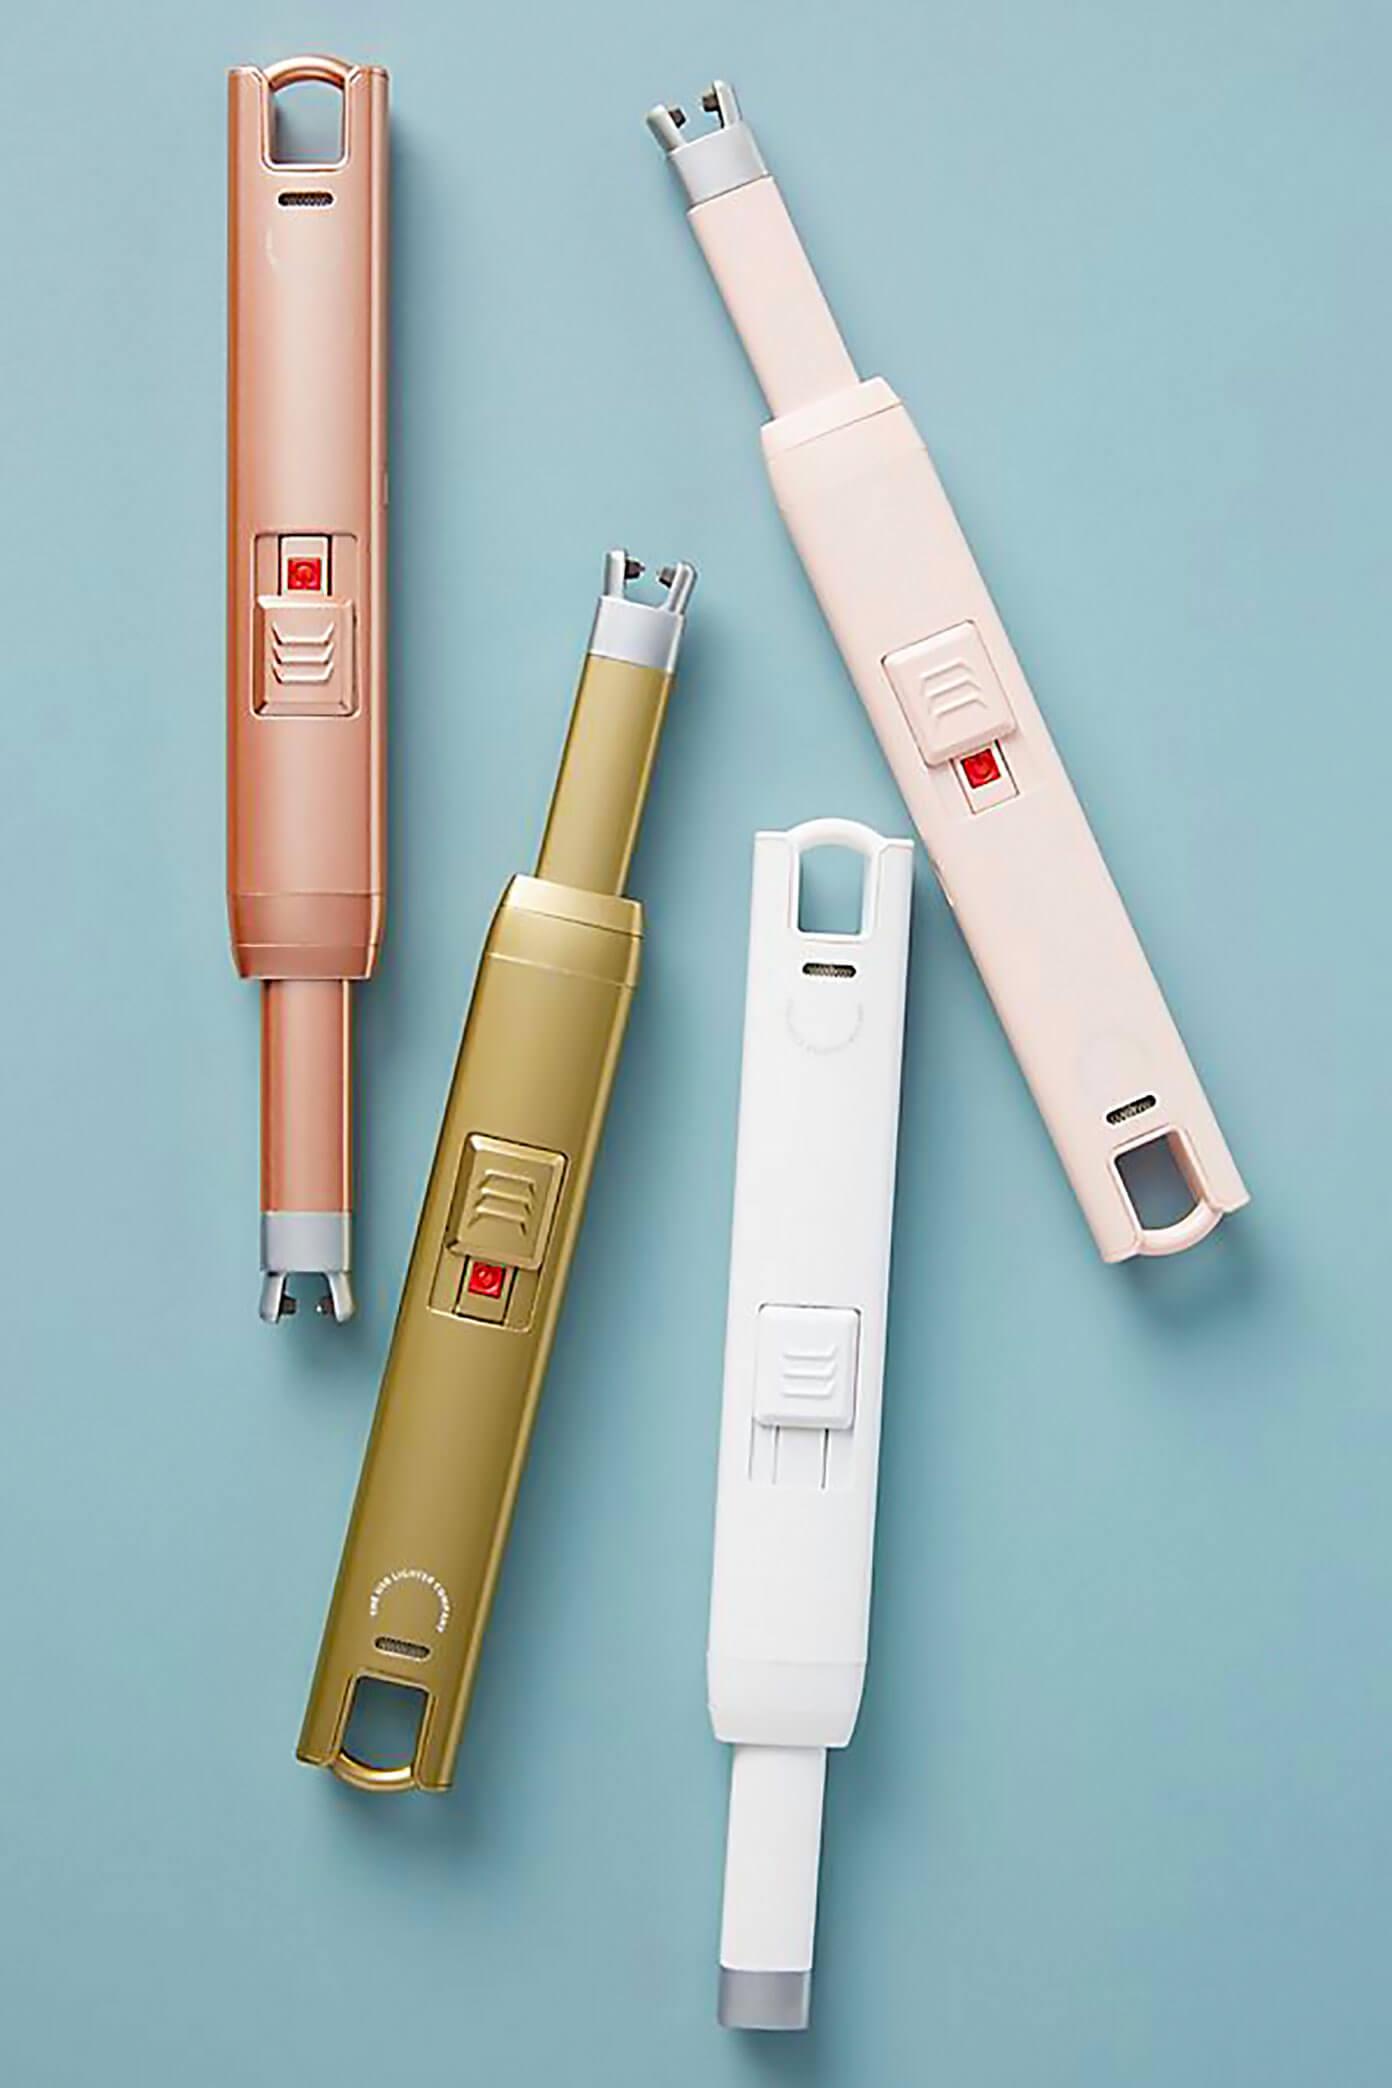 USB Lighters